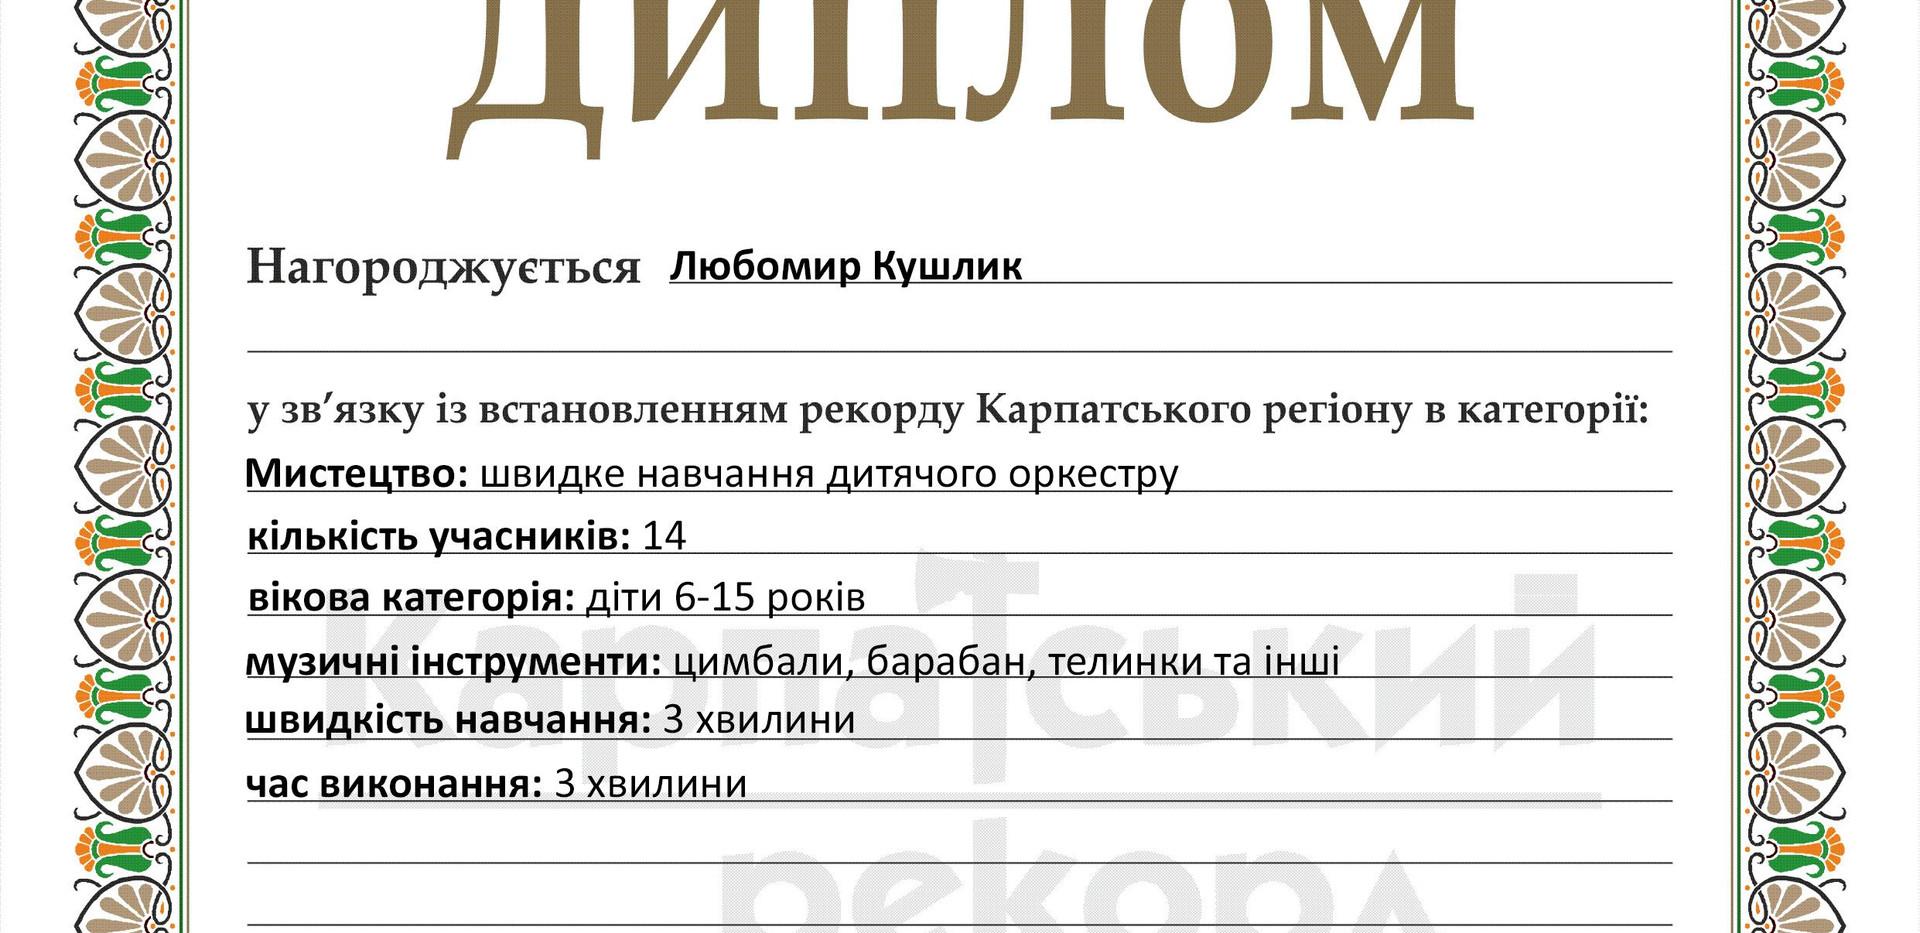 Dyplom_7_1.jpg